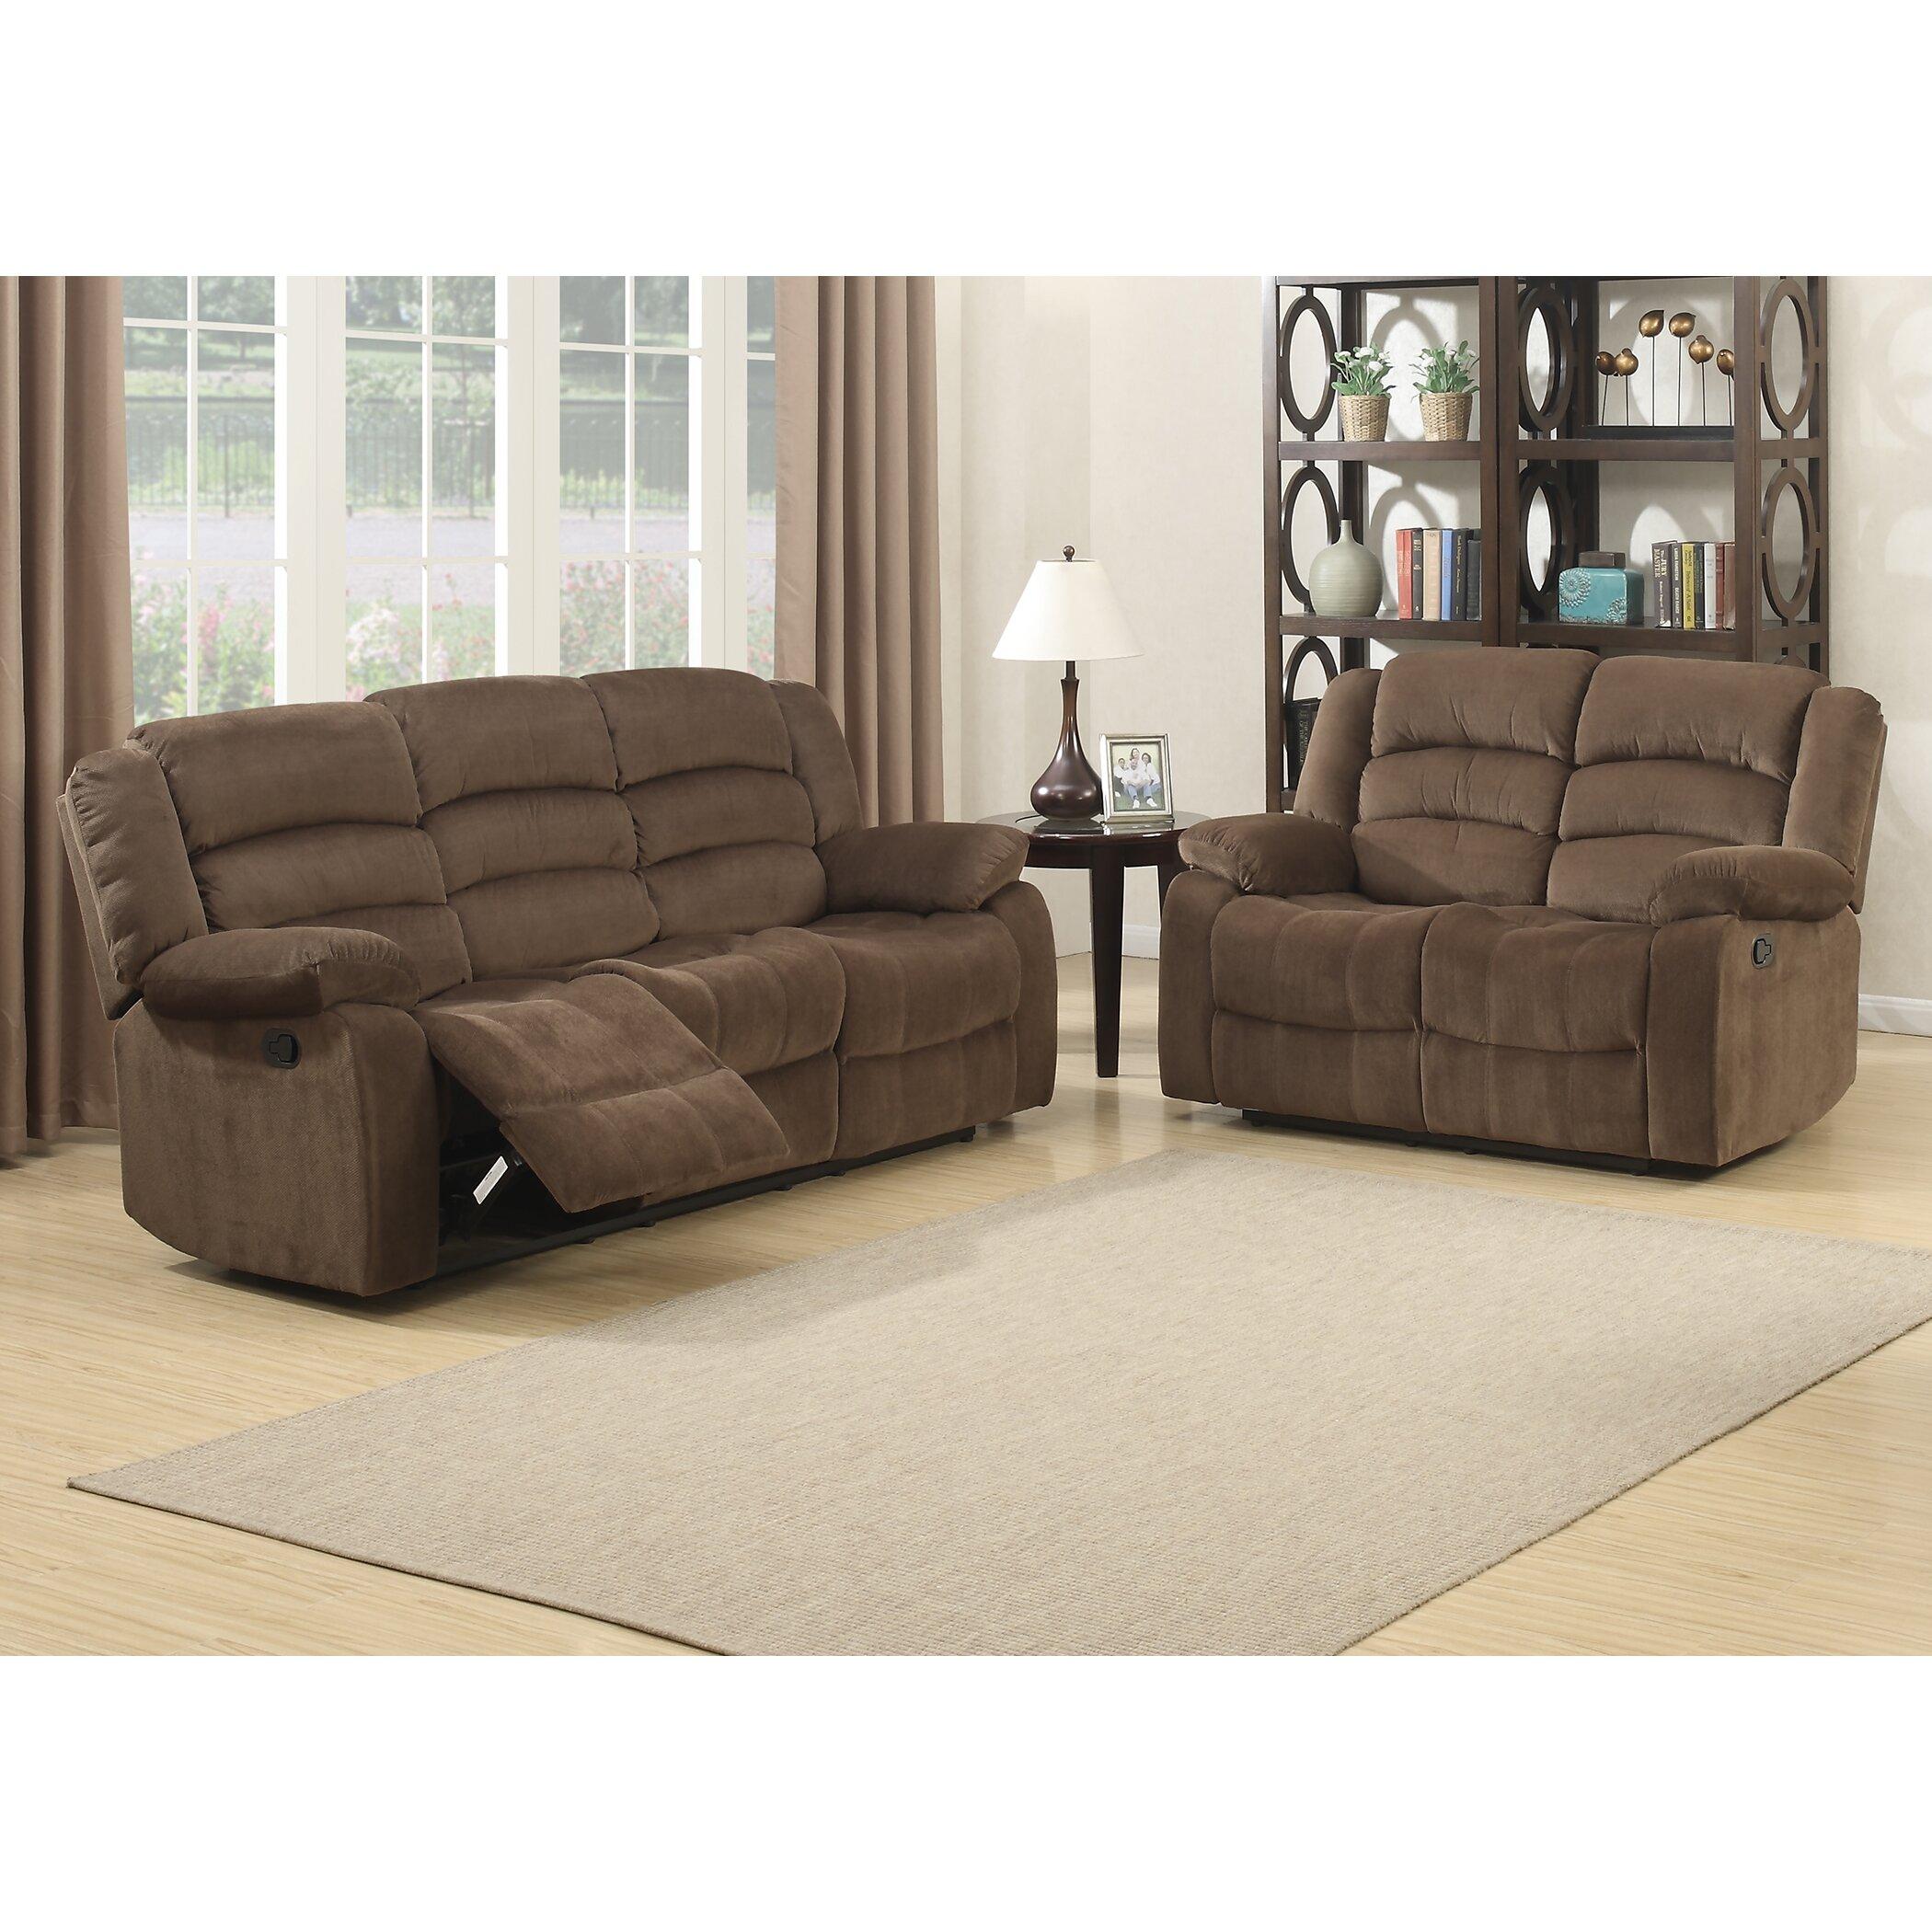 Wayfair Living Room Furniture Ac Pacific Bill Reclining Living Room Sofa And Loveseat Set